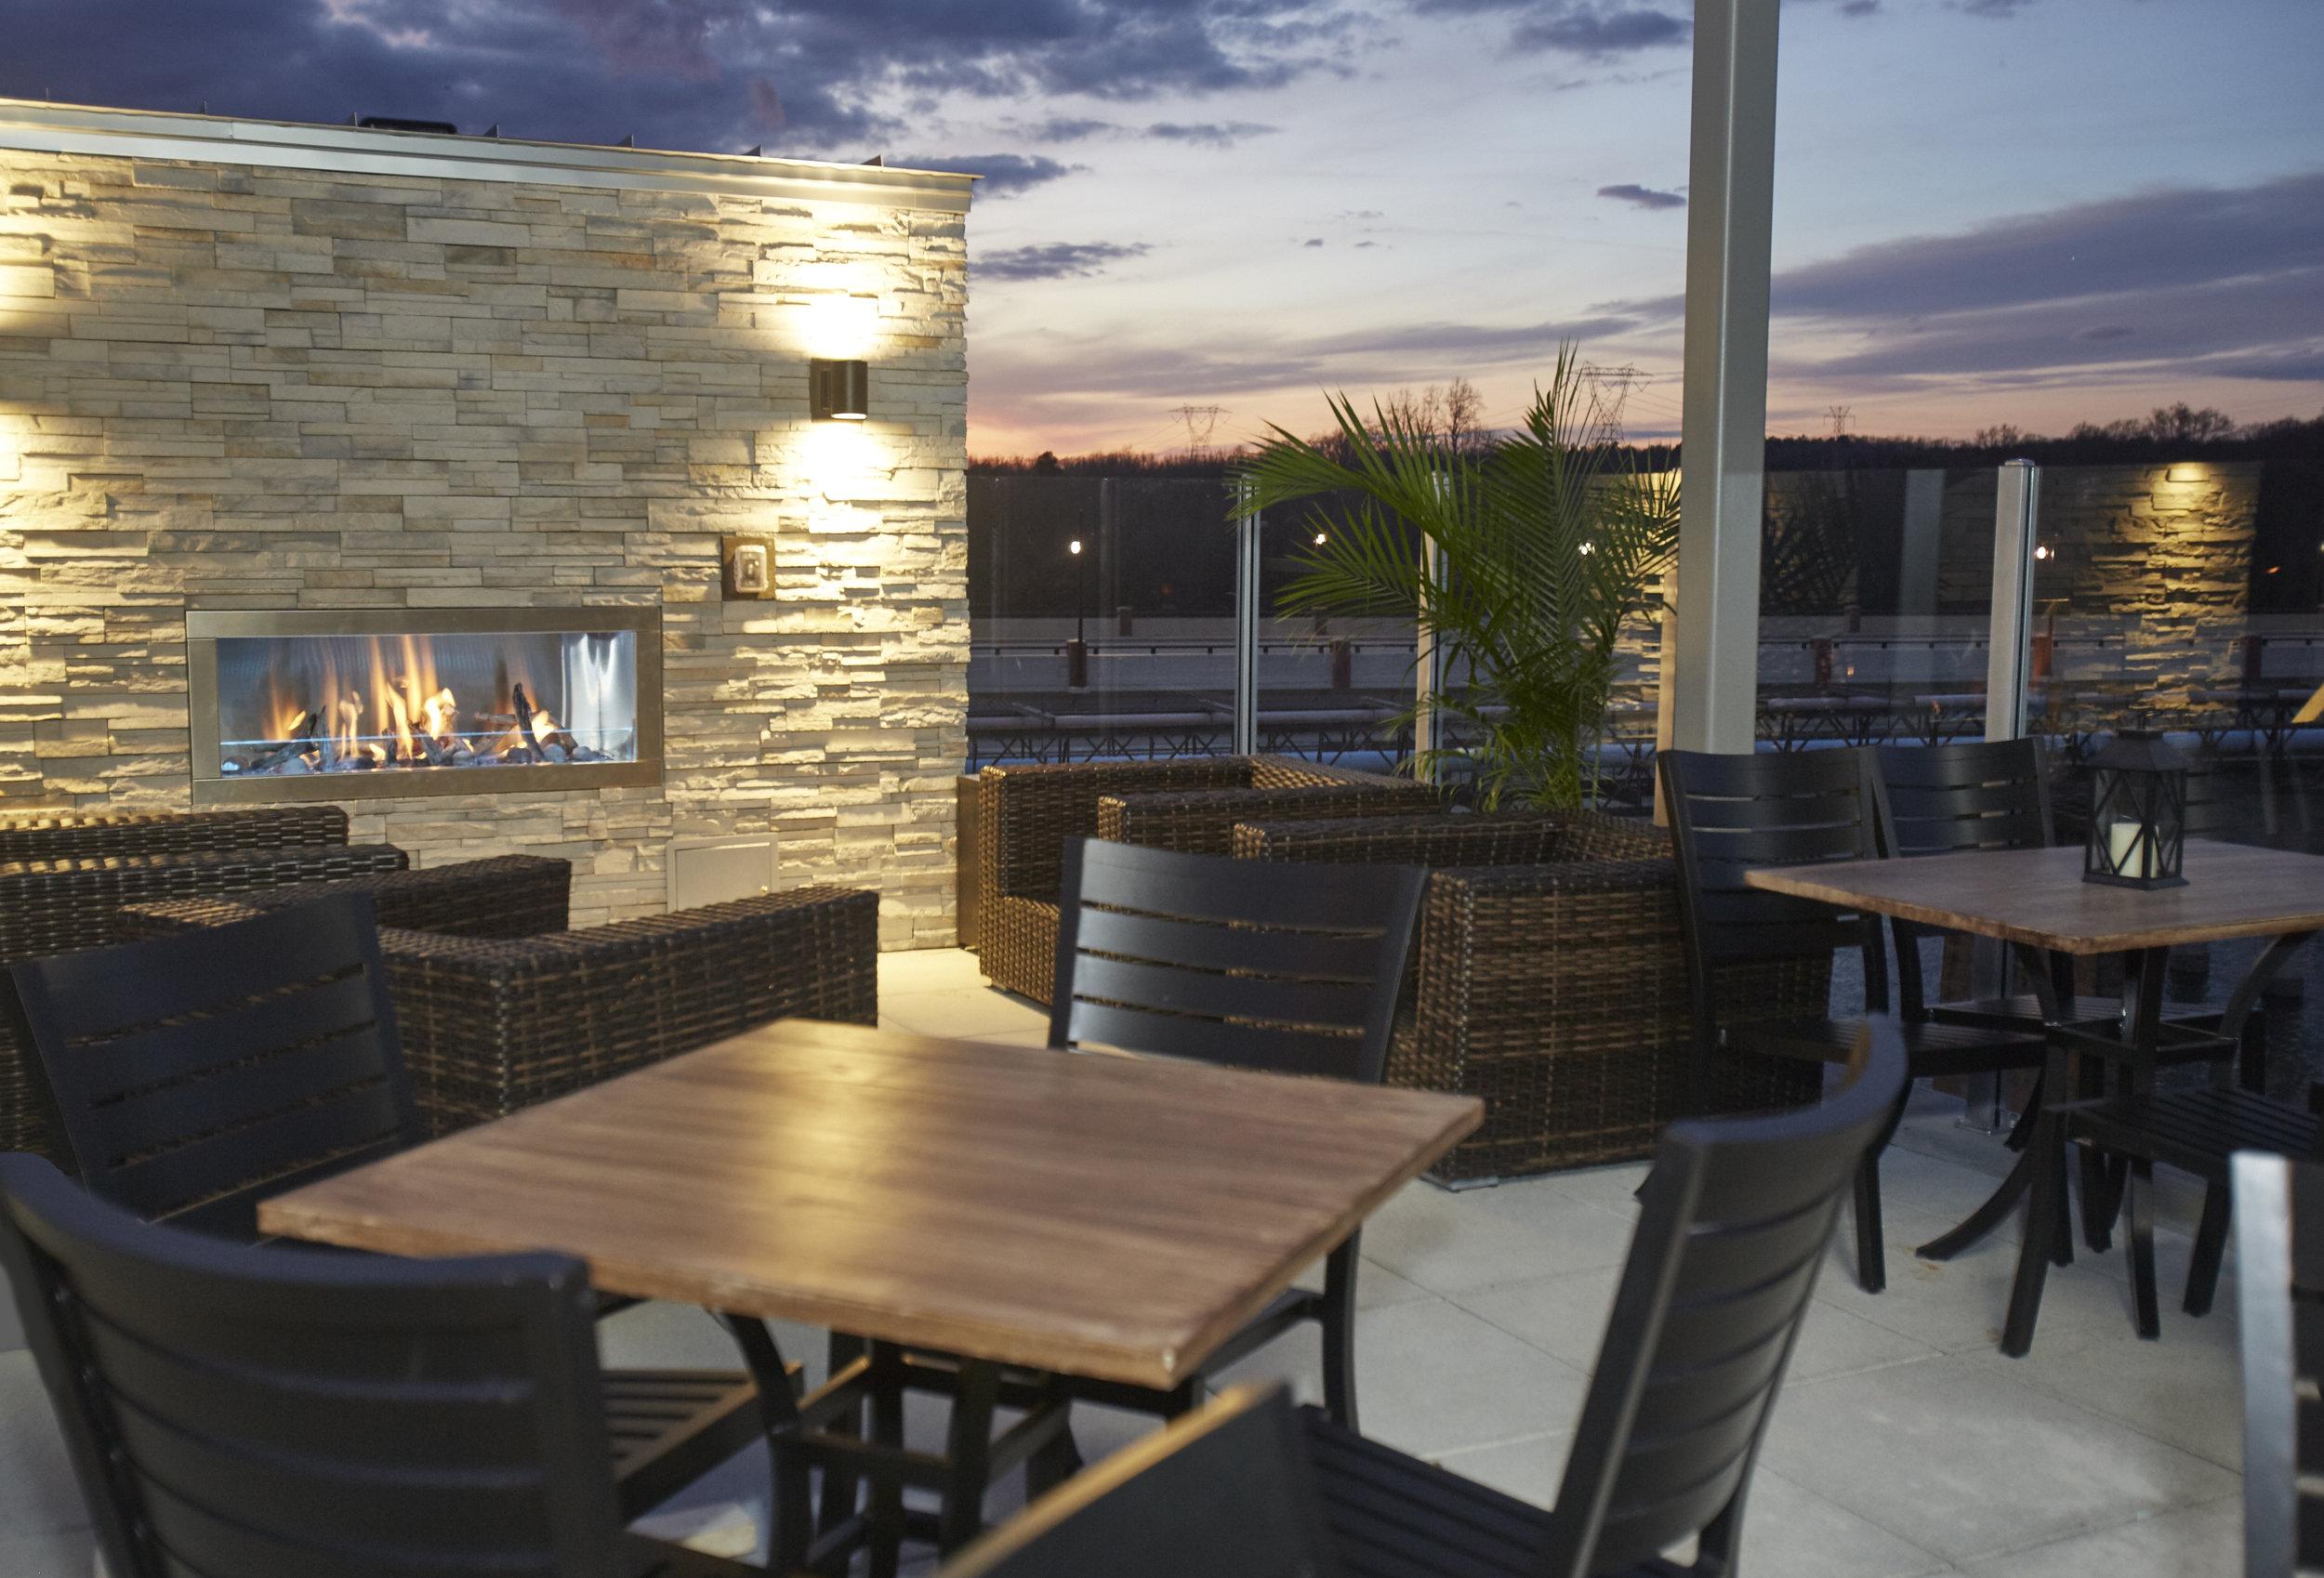 lihting a local landmark: smart restaurant lighting design -